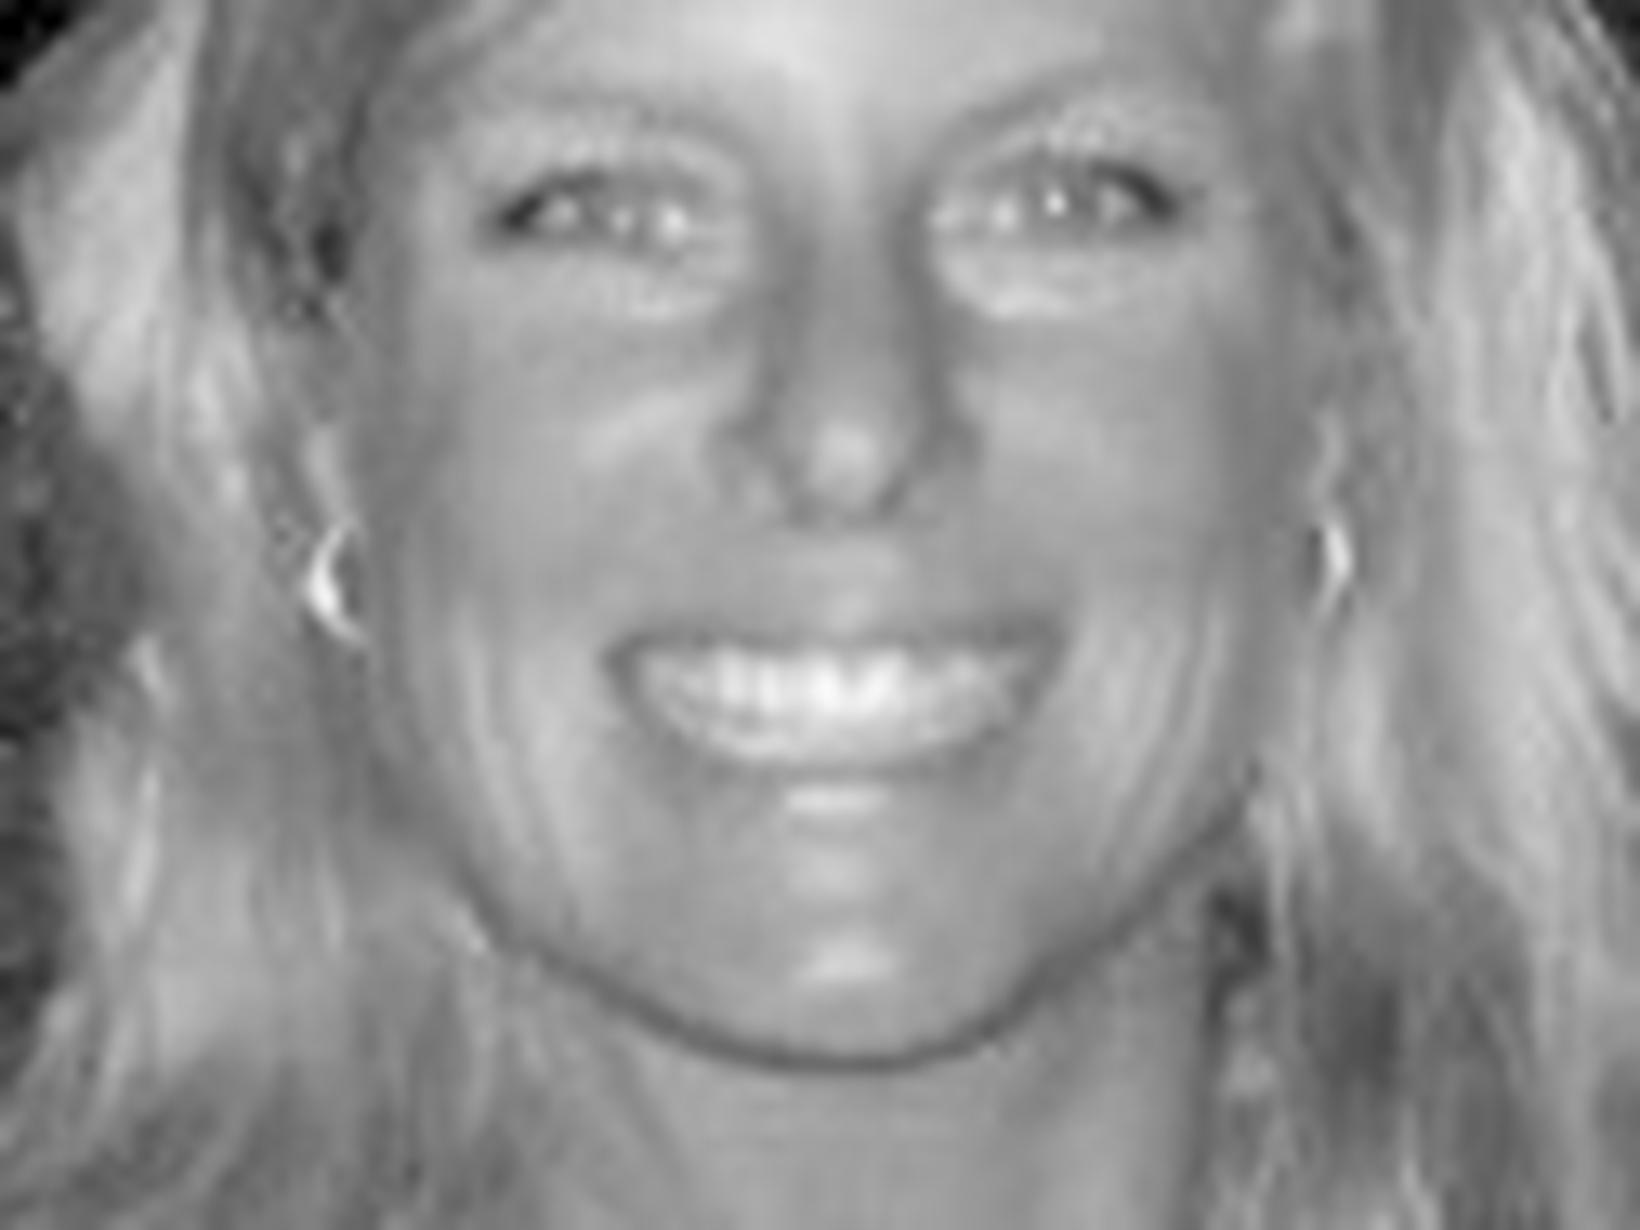 Dana from San Carlos, California, United States